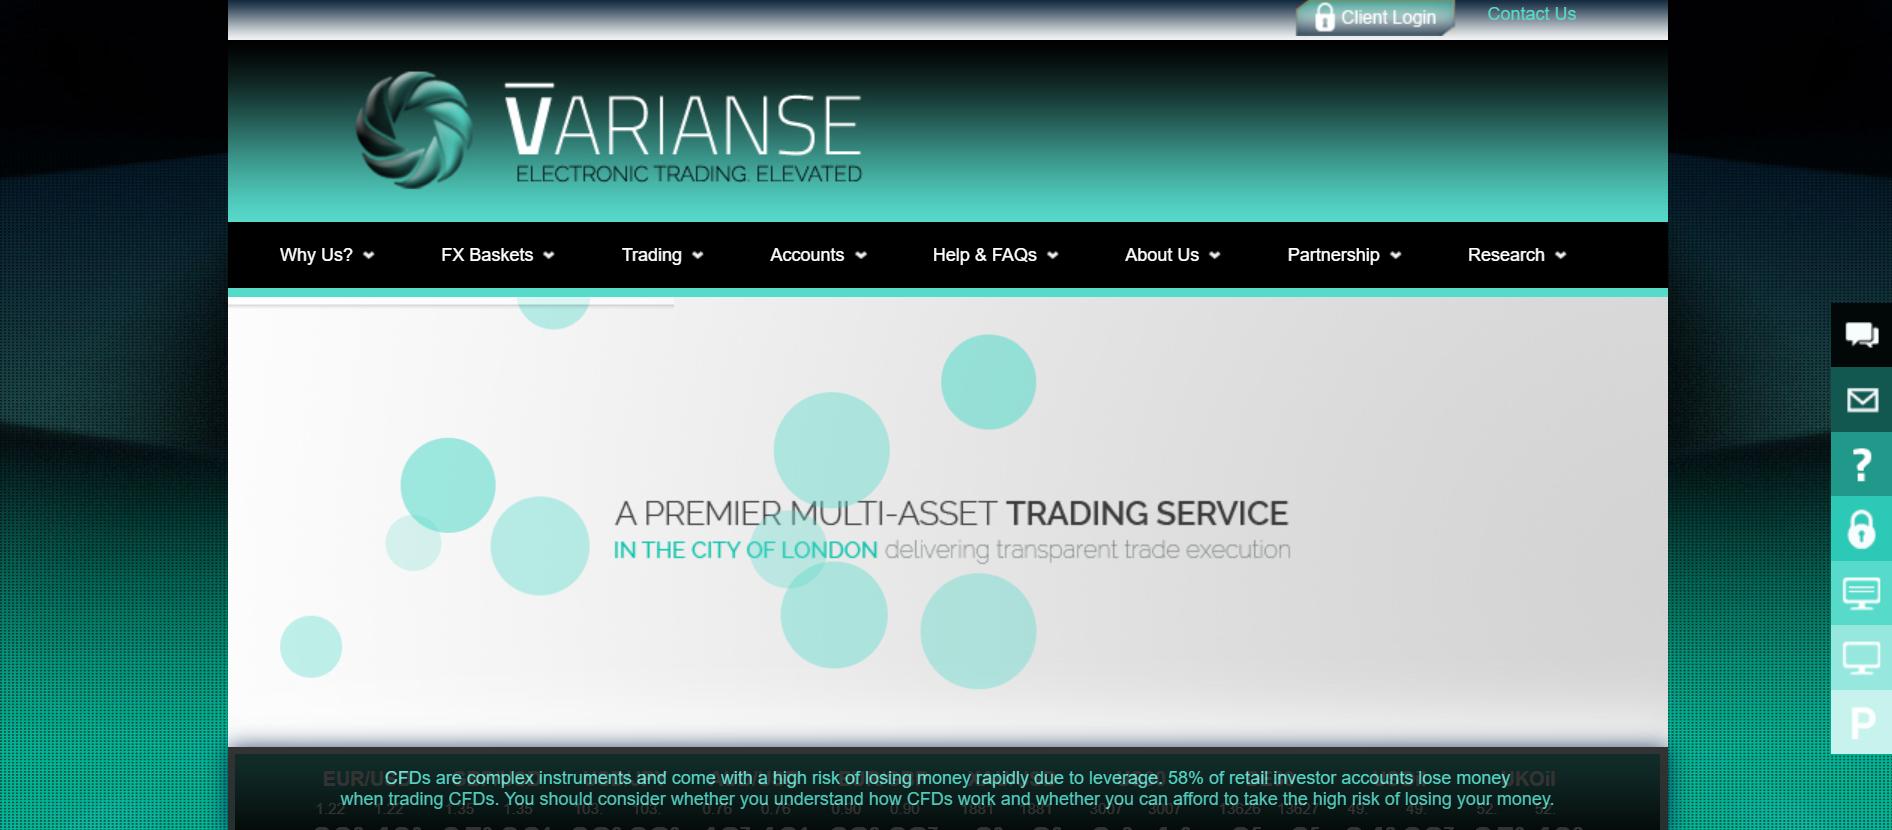 Varianse (VDX) website